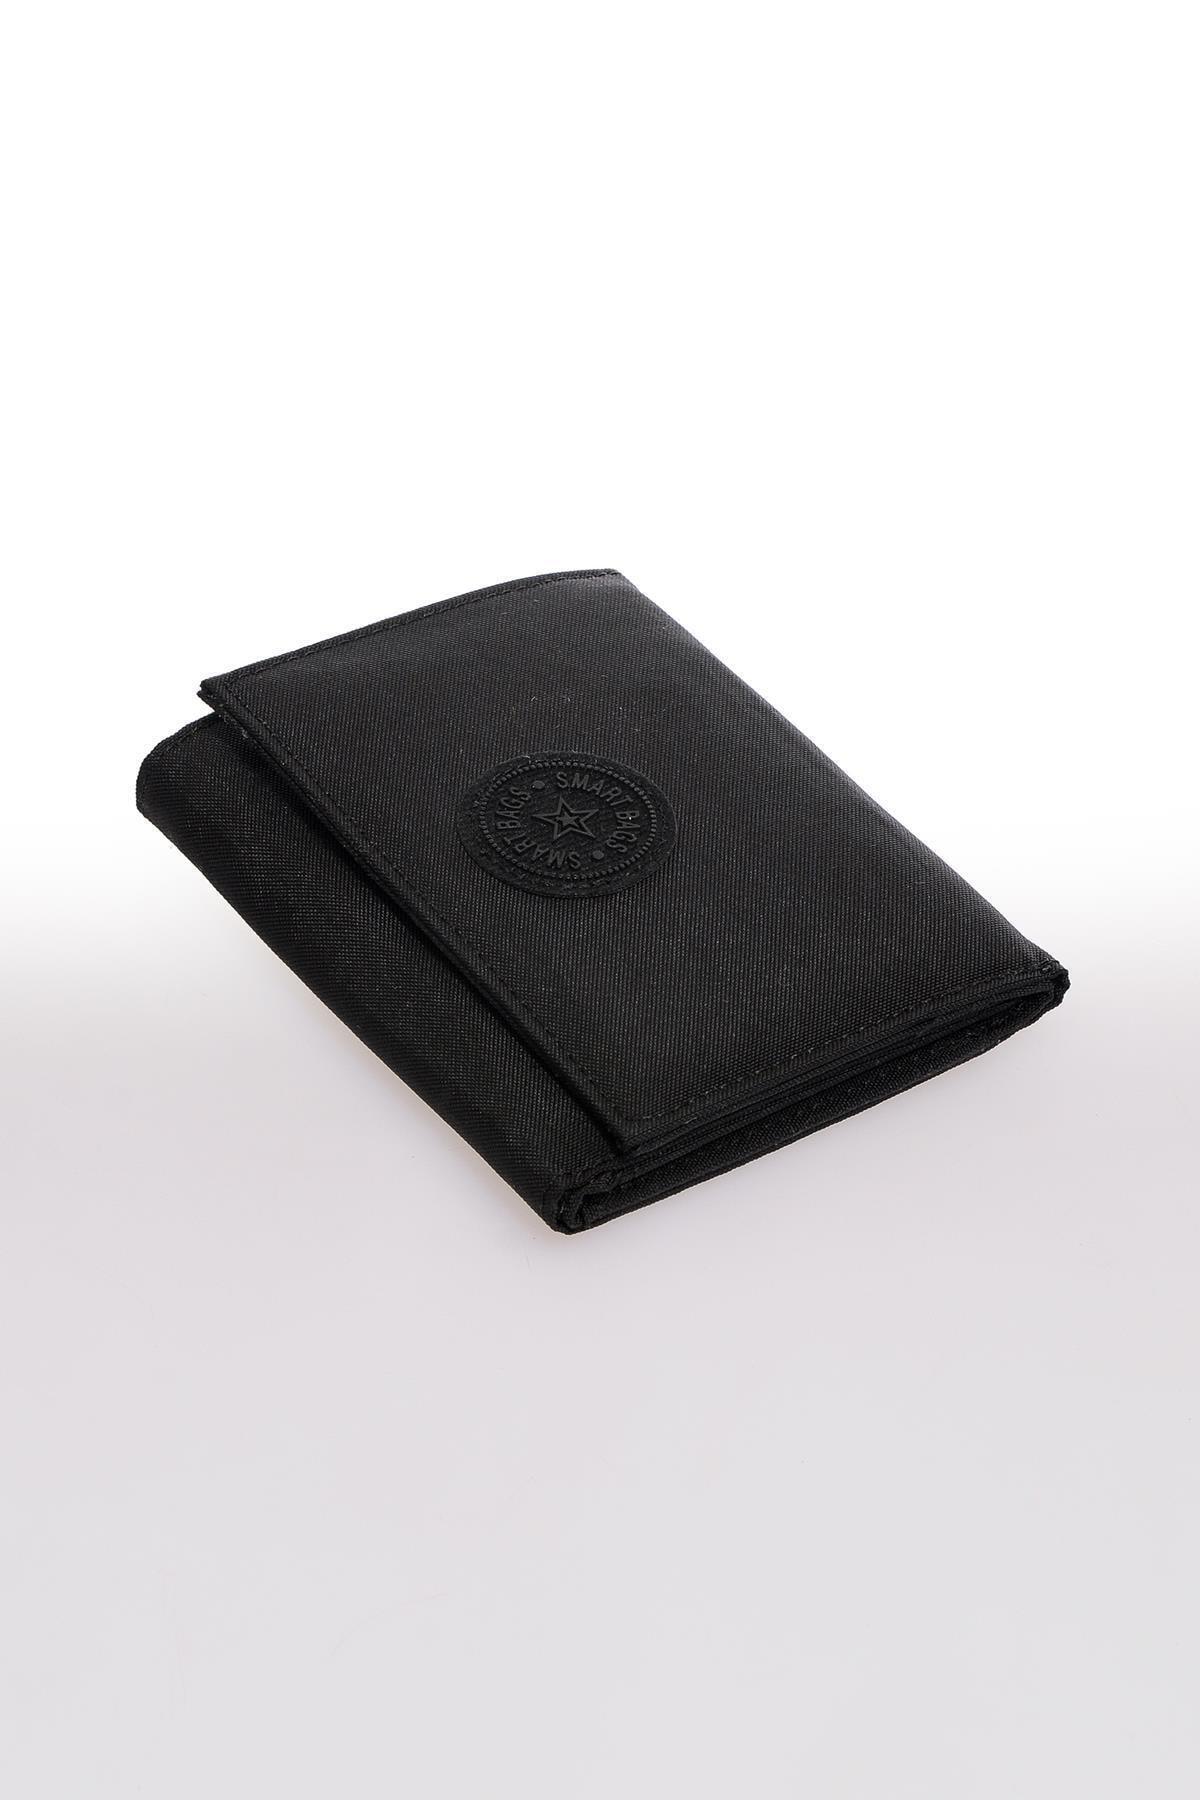 SMART BAGS Smb3050-0001 Siyah Kadın Cüzdan 1